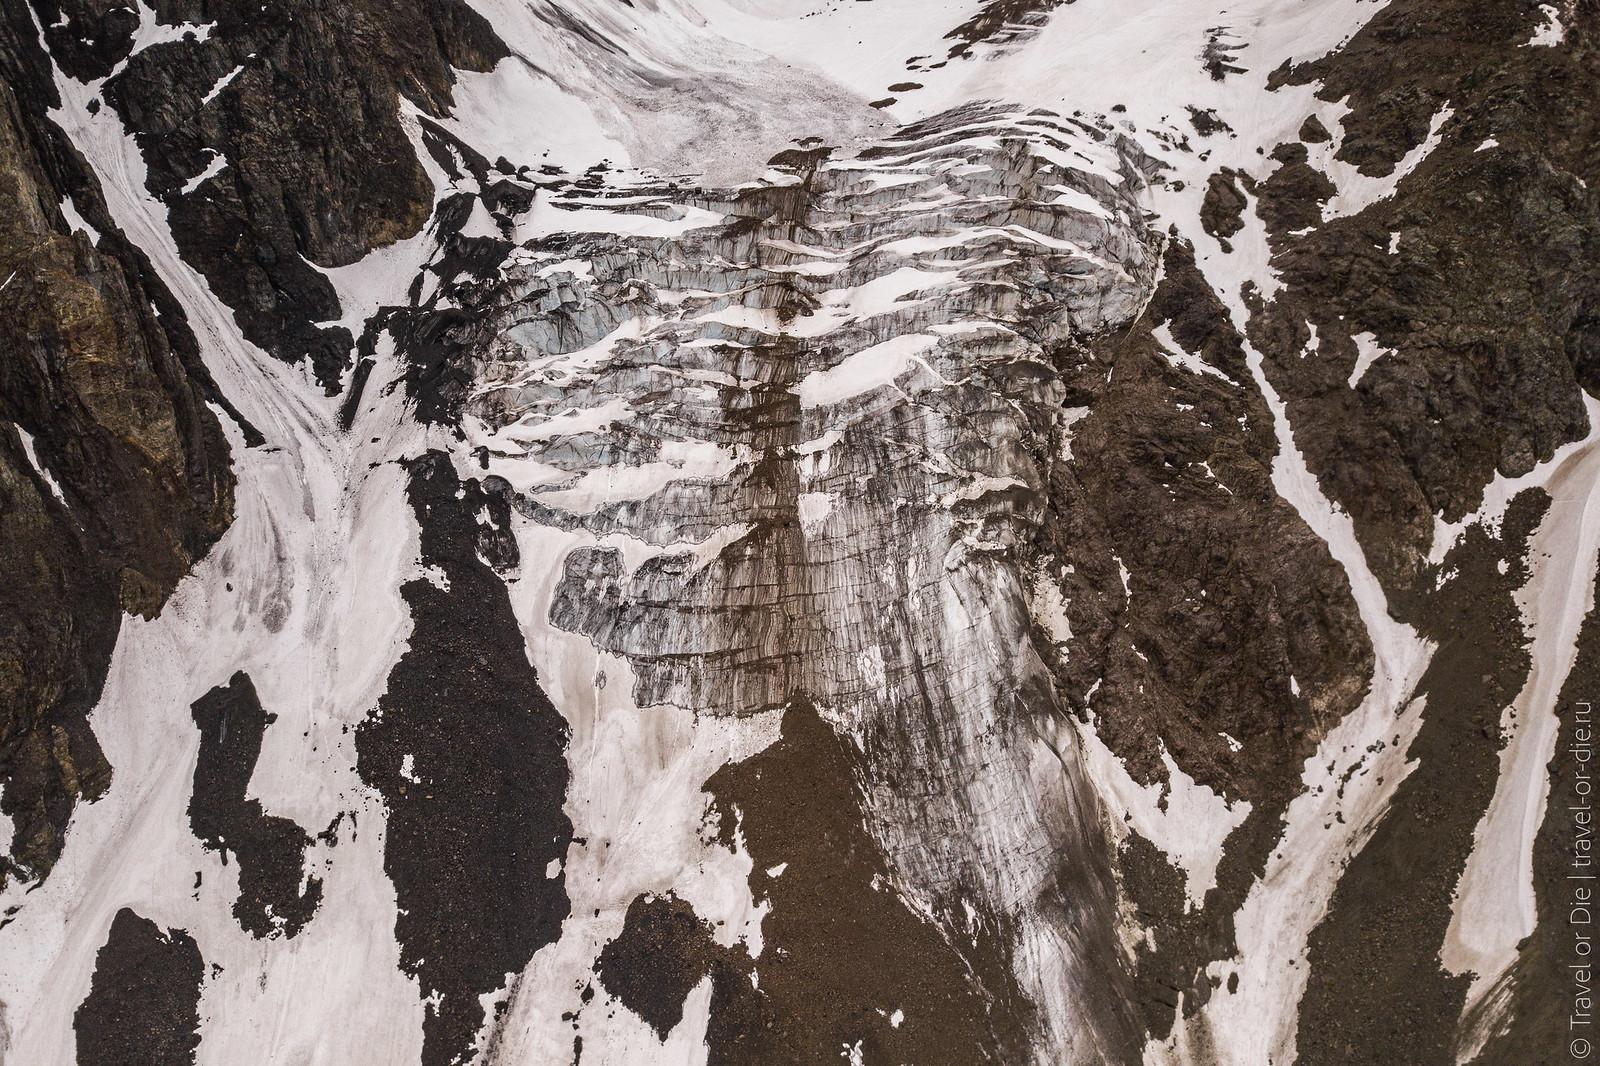 Aktru-Glacier-Altay-Ледник-Актру-Алтай-dji-mavic-0523